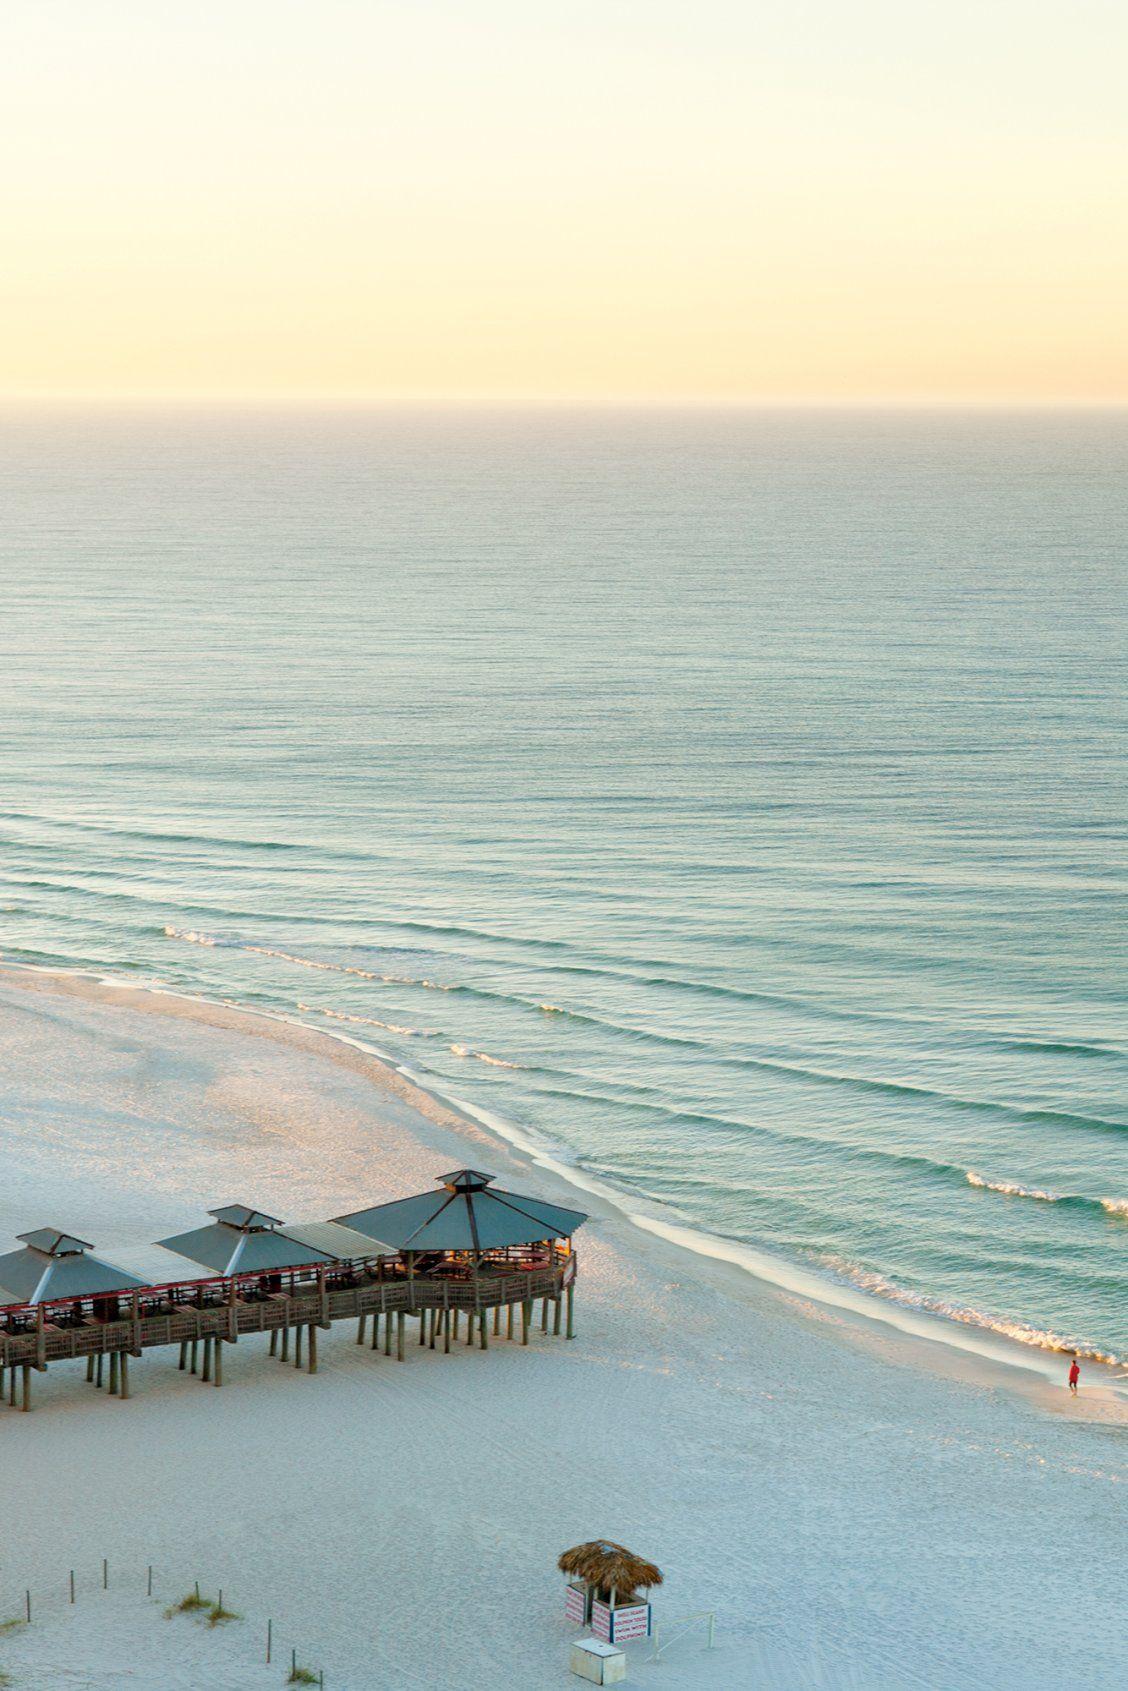 Panama City Beach, Florida has some of the best beach bars. #pcb #florida #beaches #bars